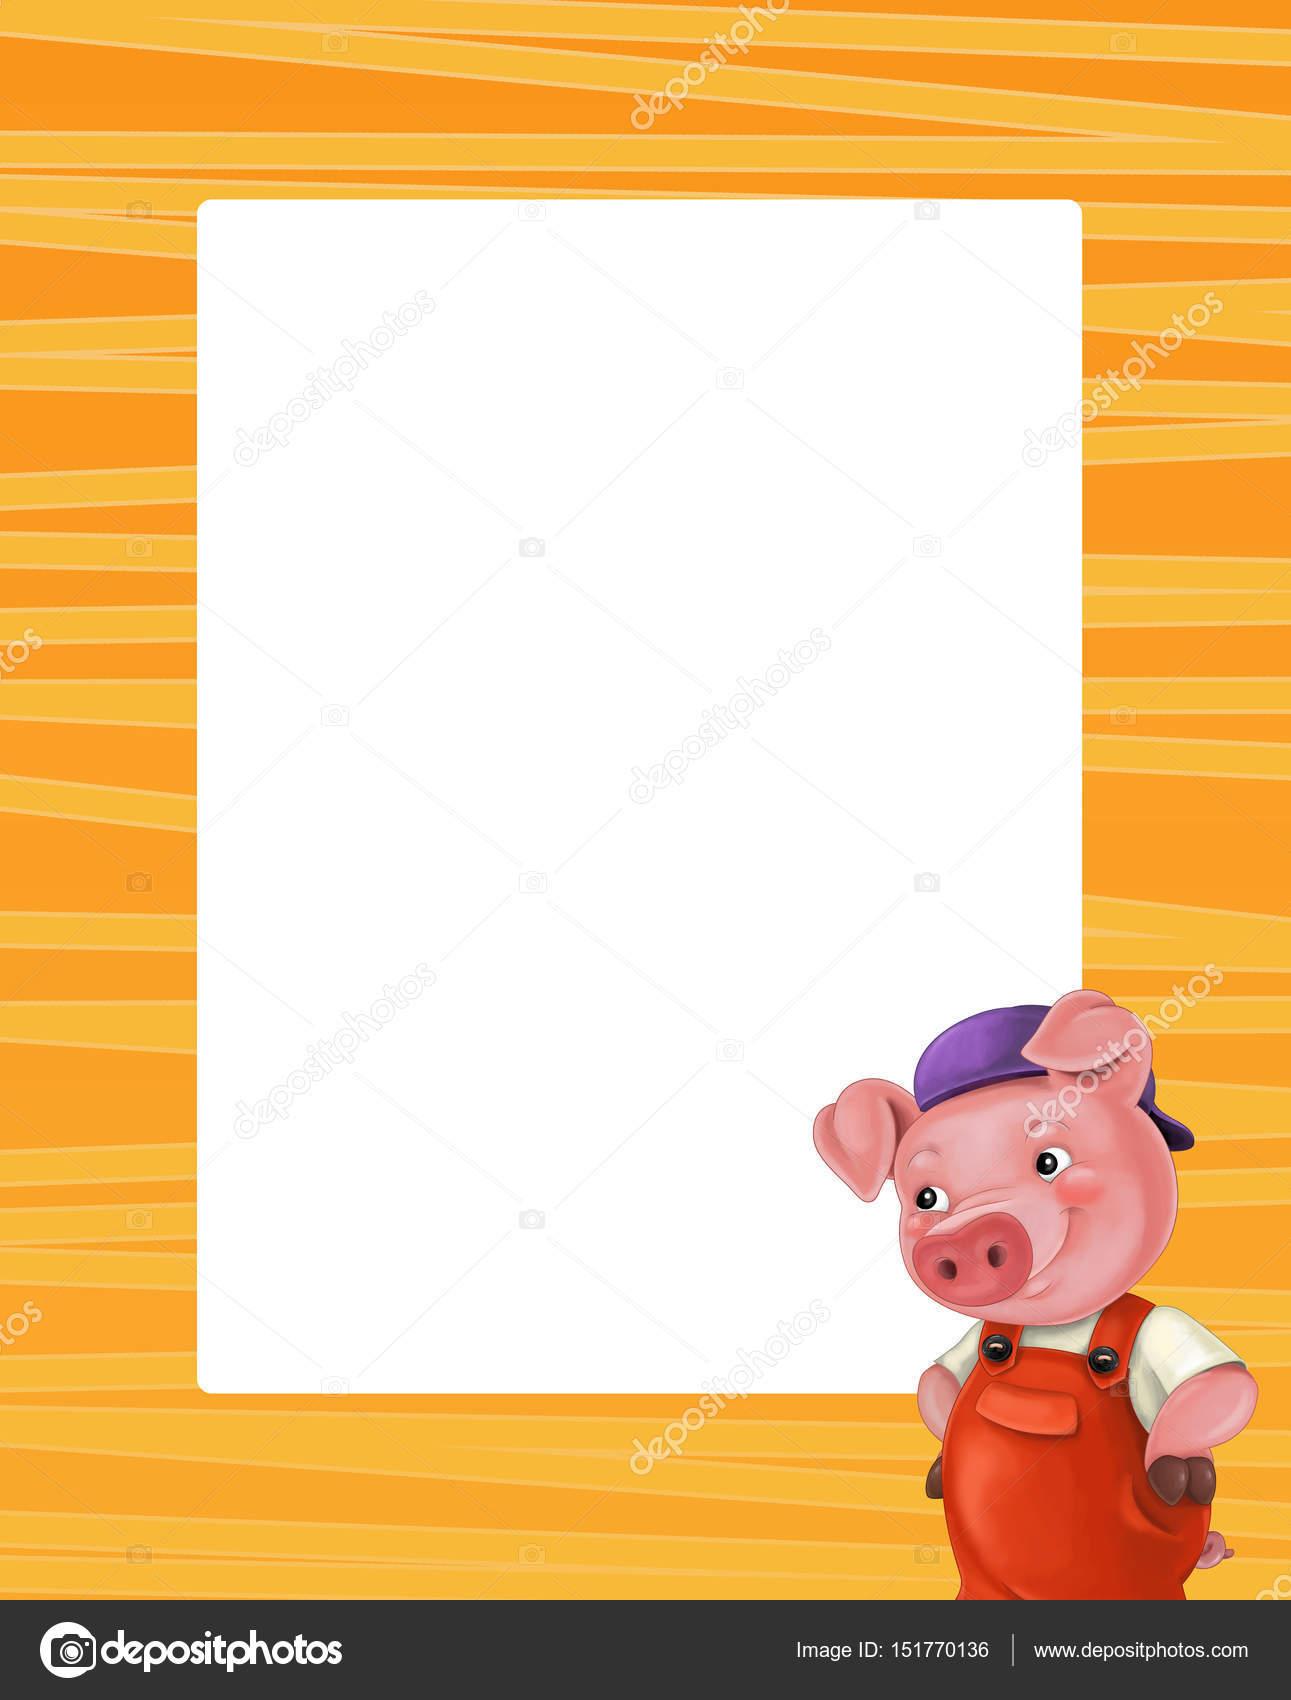 marco de dibujos animados con cerdo lindo — Fotos de Stock ...